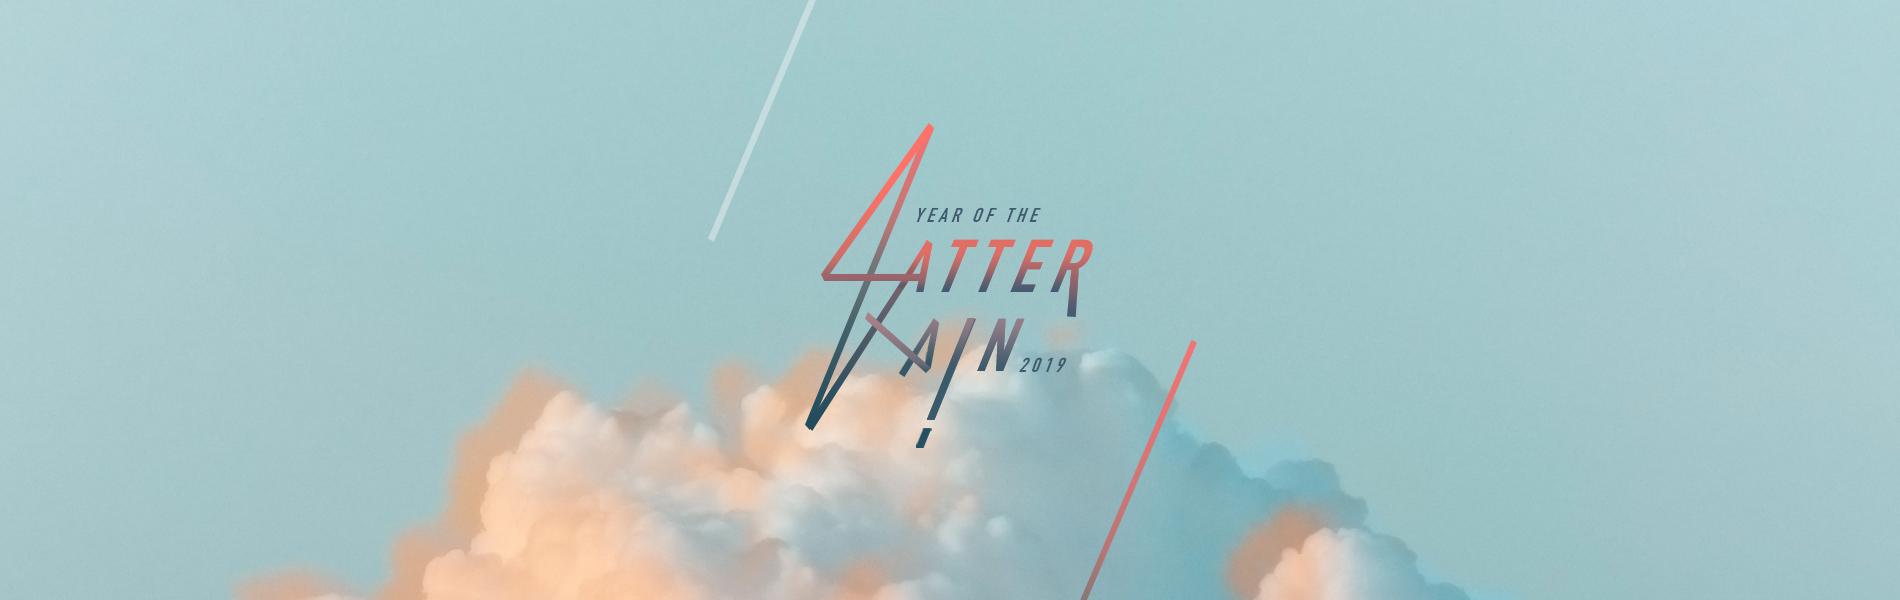 2019_02_Feb-Year-of-the-Latter-Rain_EN New Creation TV   Broadcasting the Gospel of Jesus